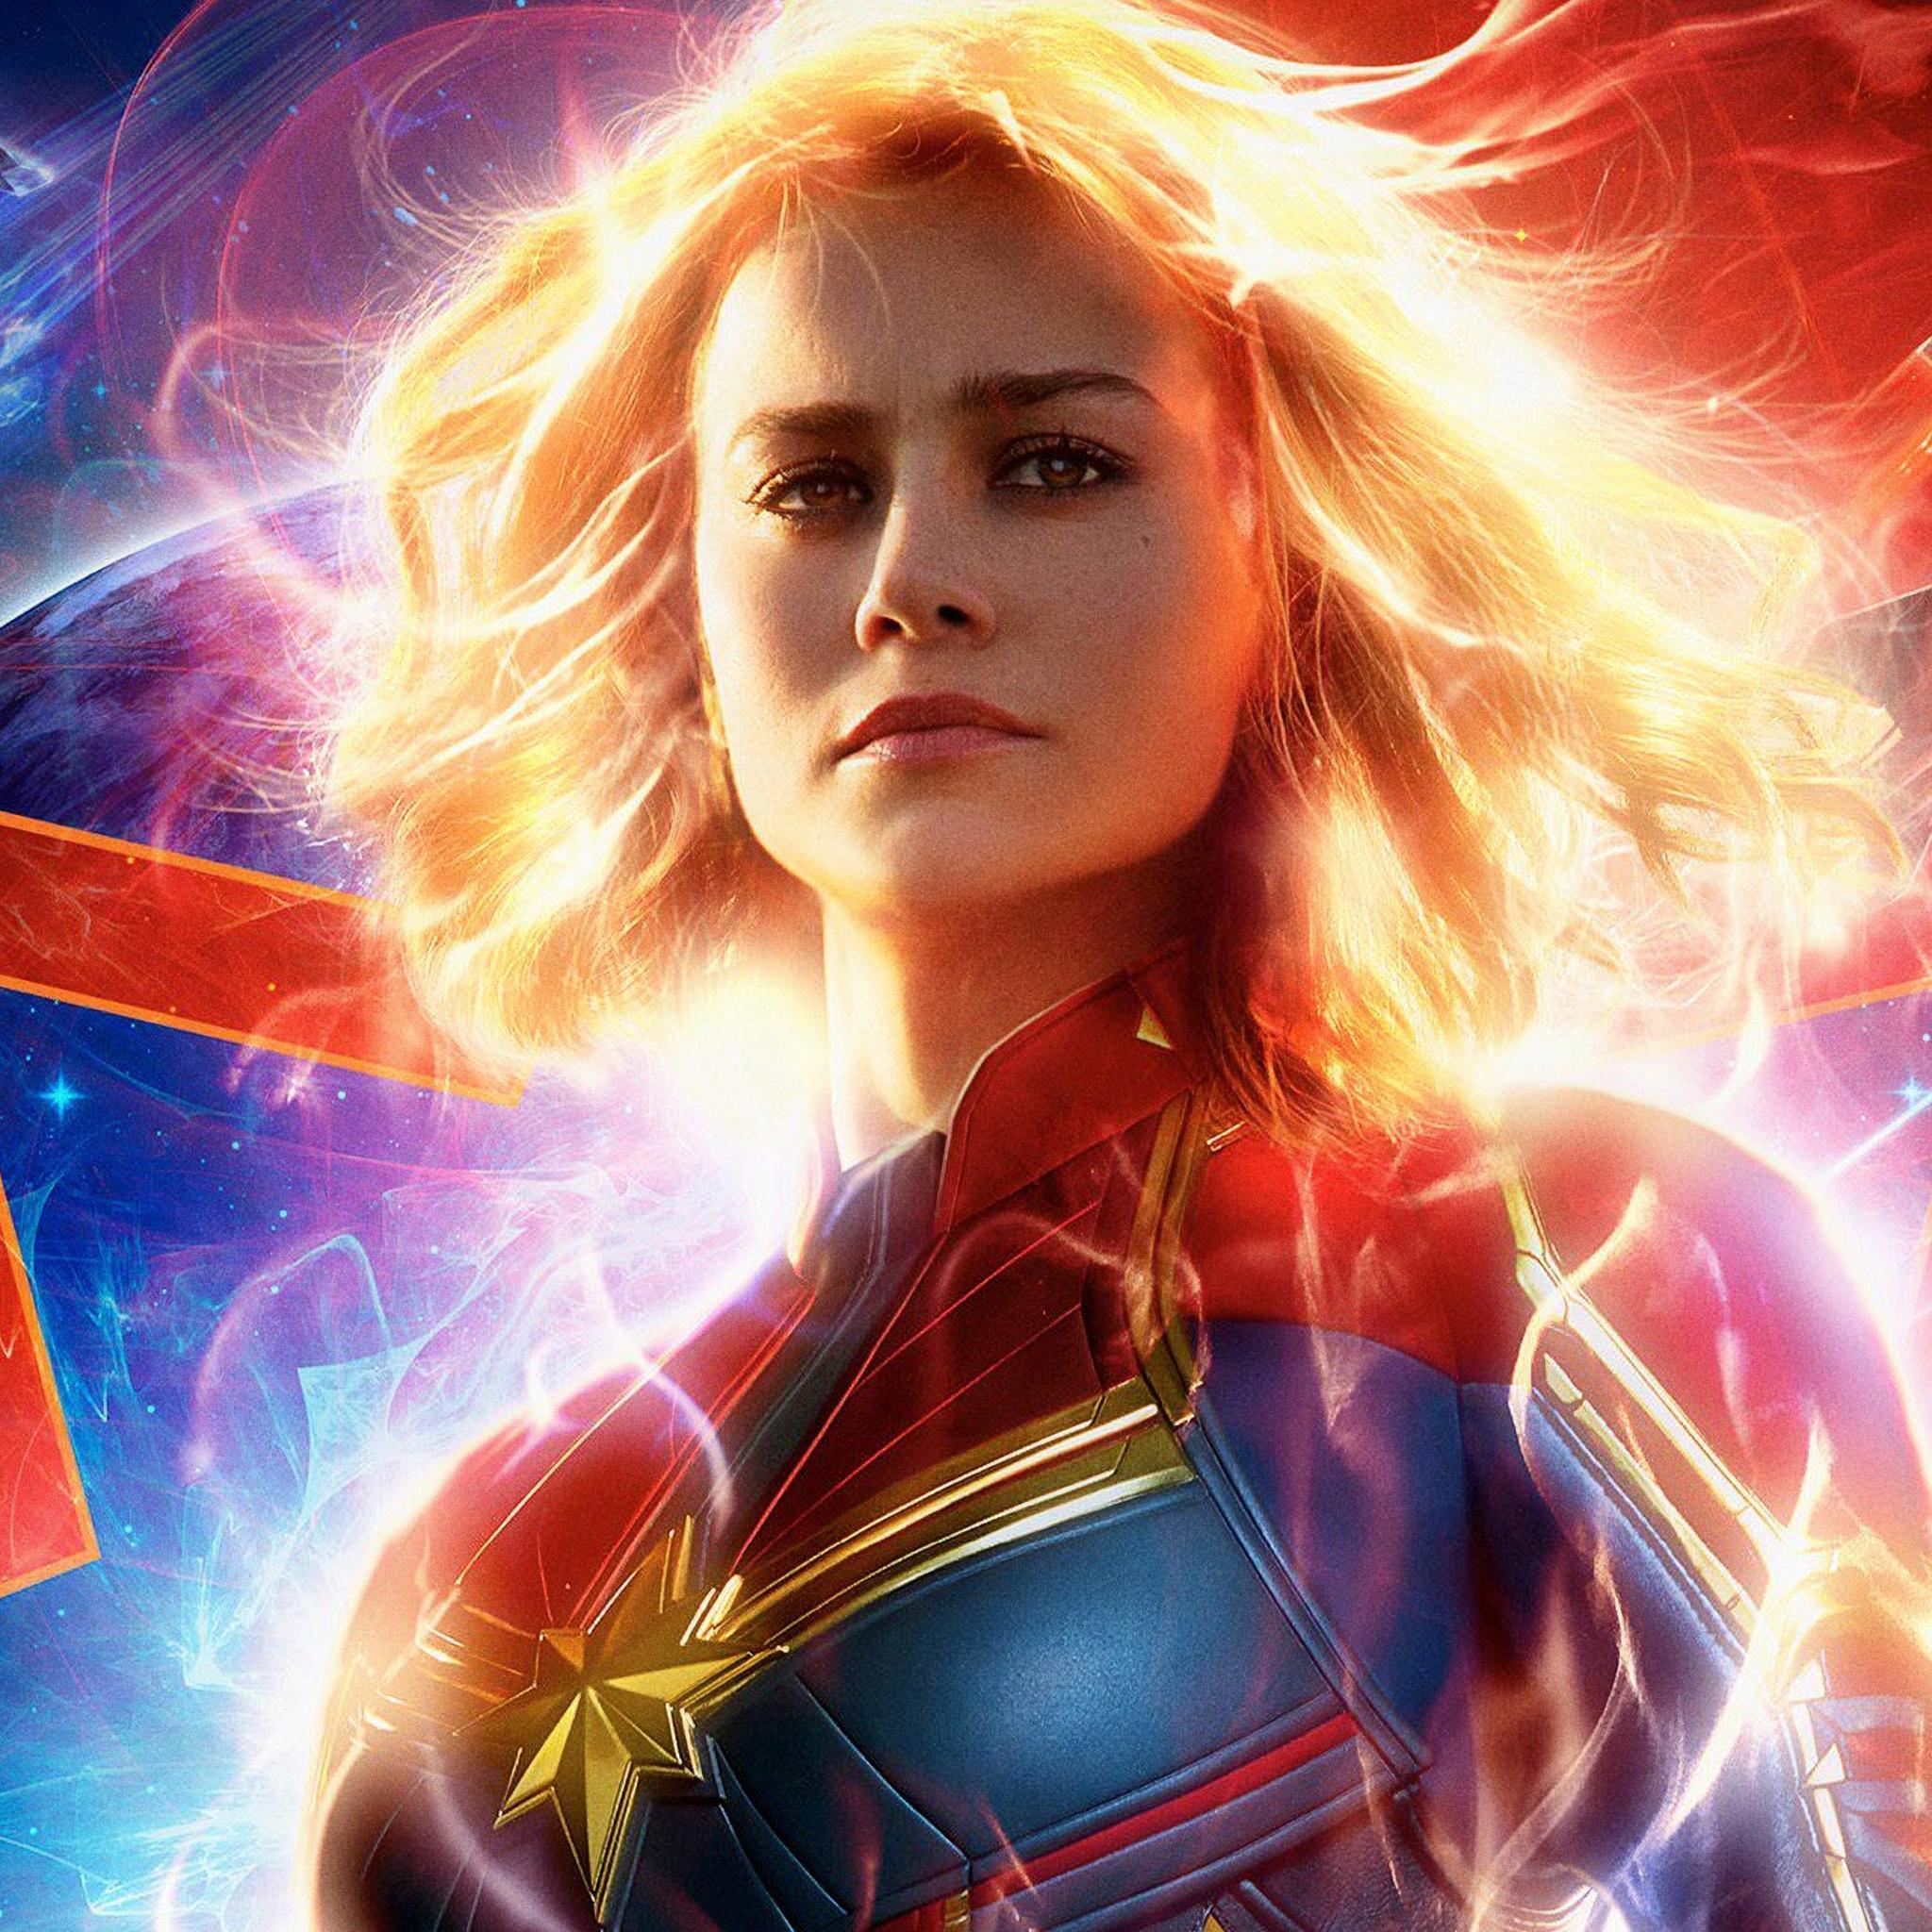 2048x2048 Captain Marvel Movie 2019 4k Ipad Air HD 4k